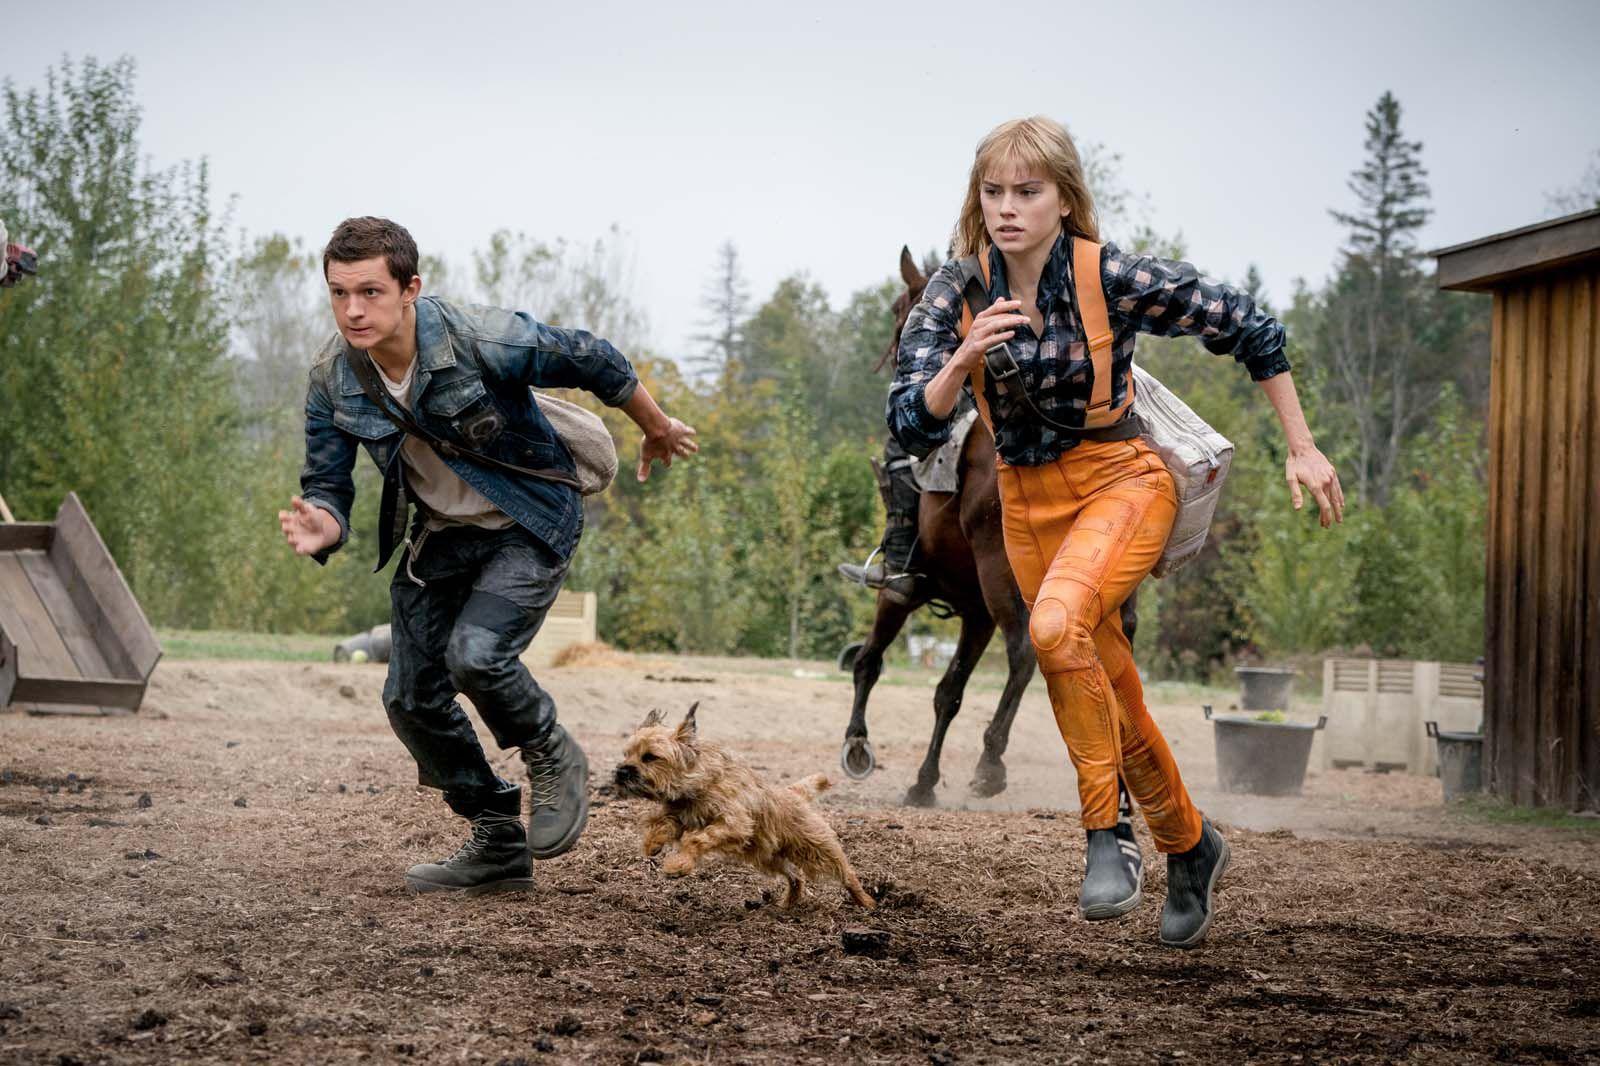 Chaos Walking (BANDE-ANNONCE) avec Tom Holland, Daisy Ridley, Mads Mikkelsen, Nick Jonas - Le 3 février 2021 au cinéma